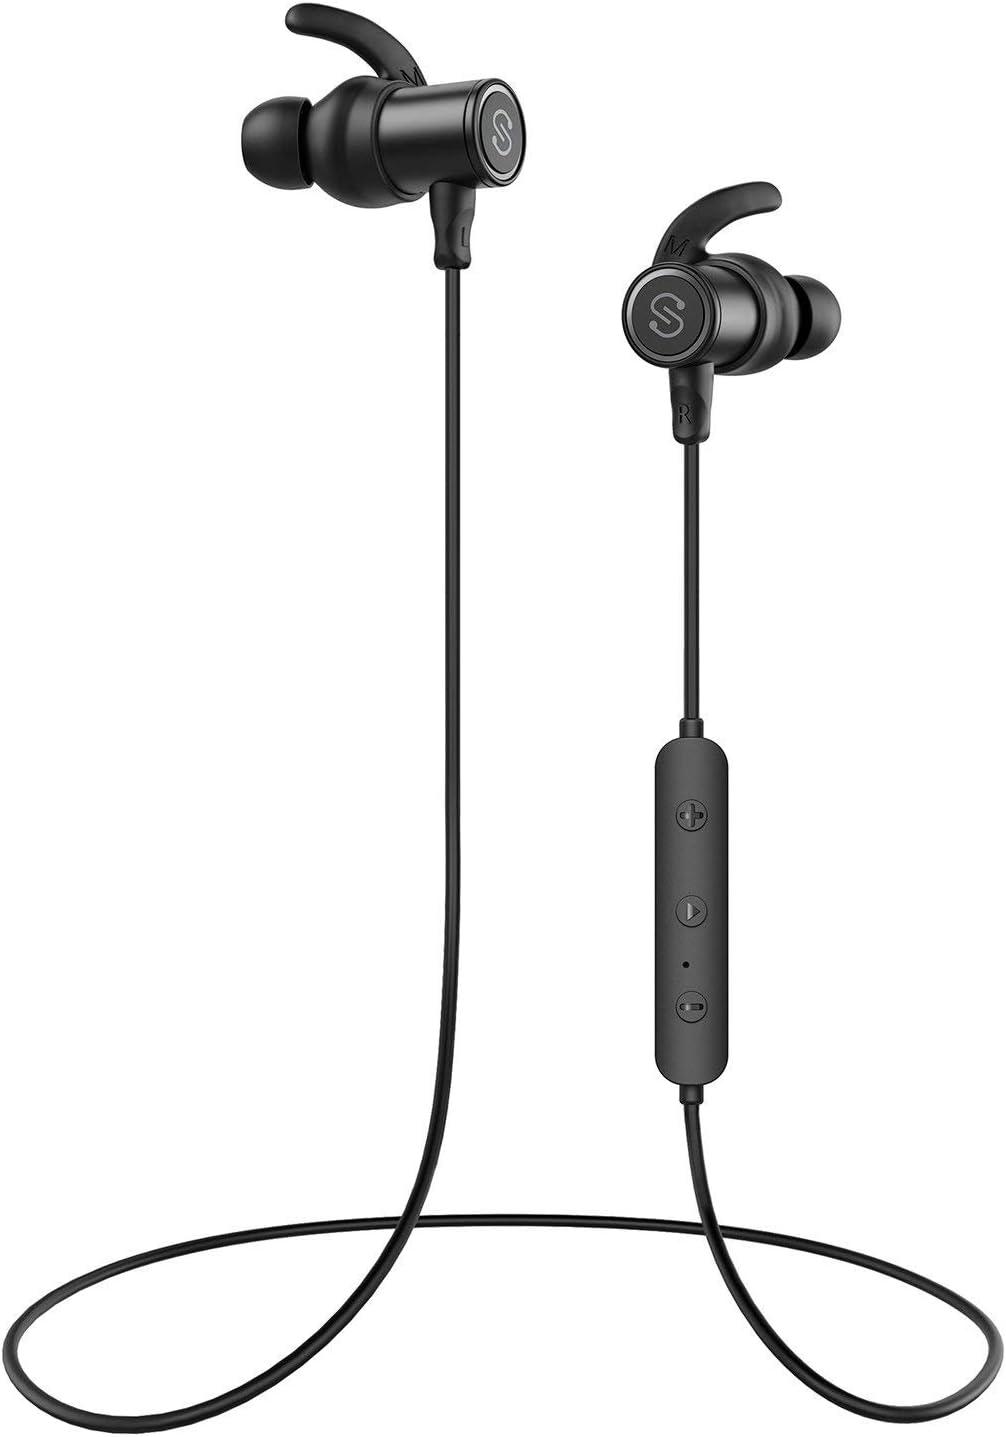 Amazon.com: SoundPEATS - Auriculares inalámbricos Bluetooth ...